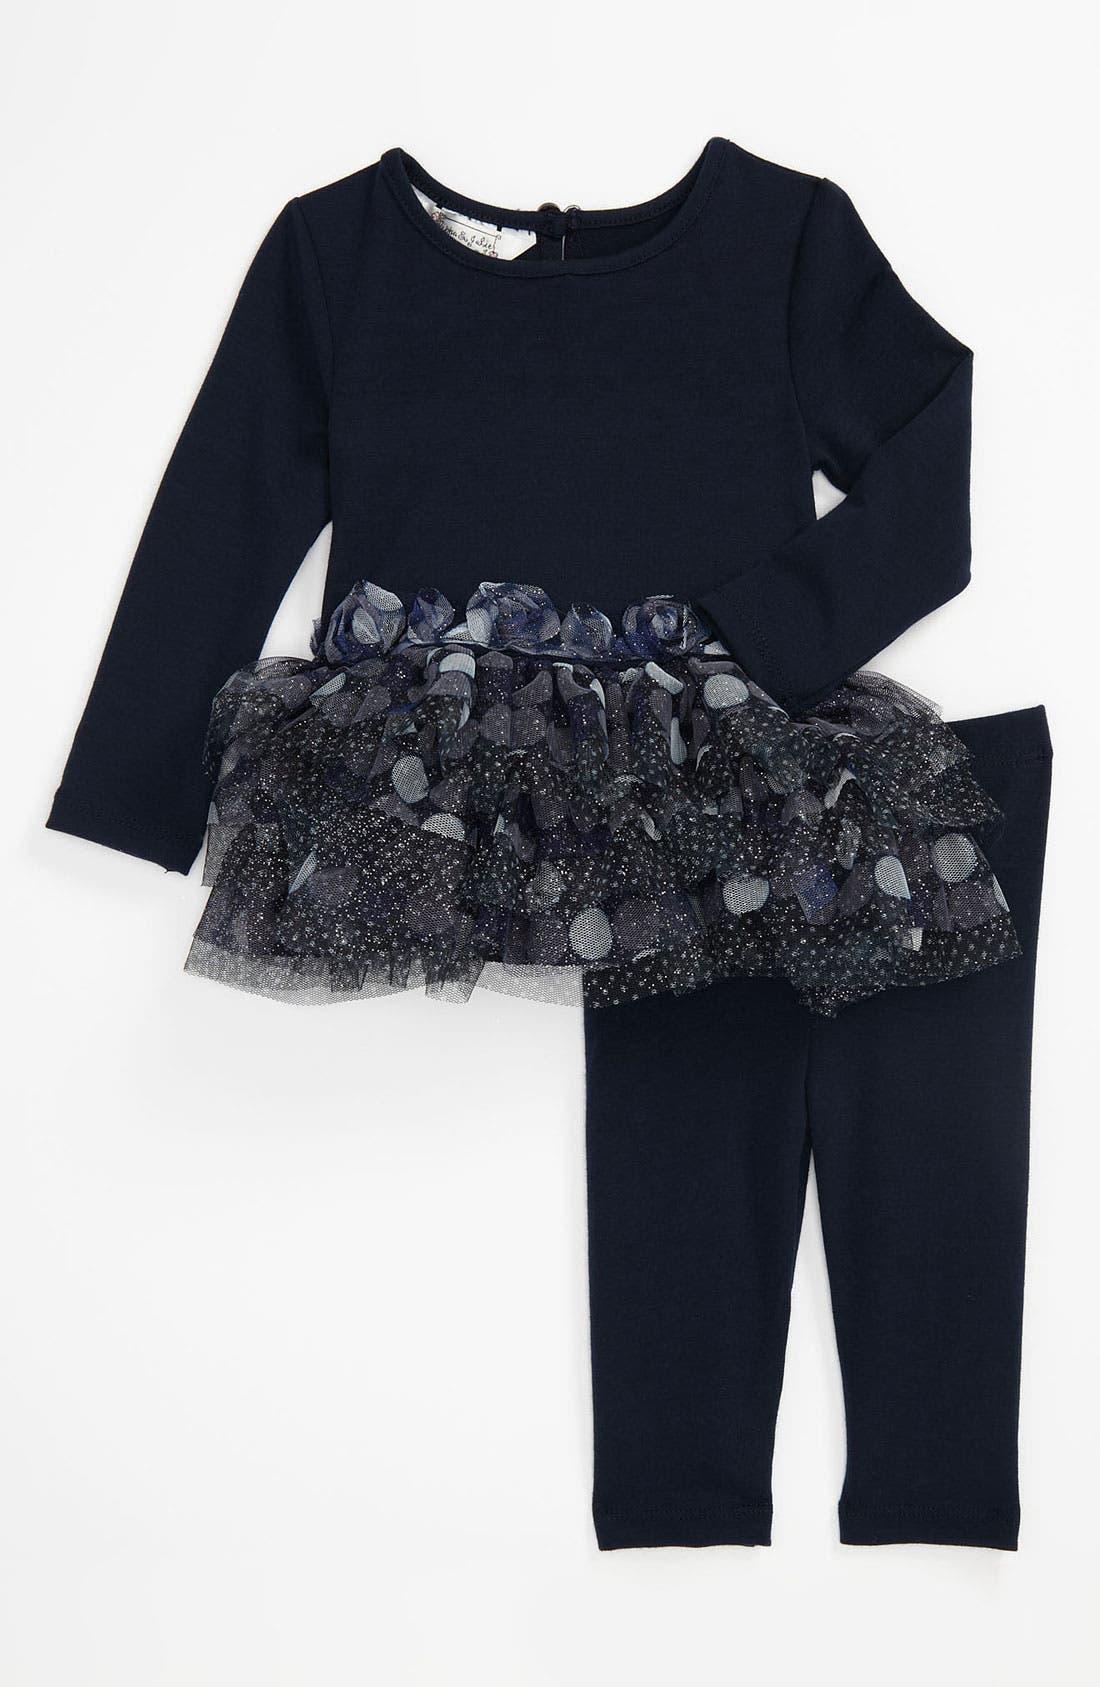 Alternate Image 1 Selected - Pippa & Julie Knit Top & Leggings (Infant)